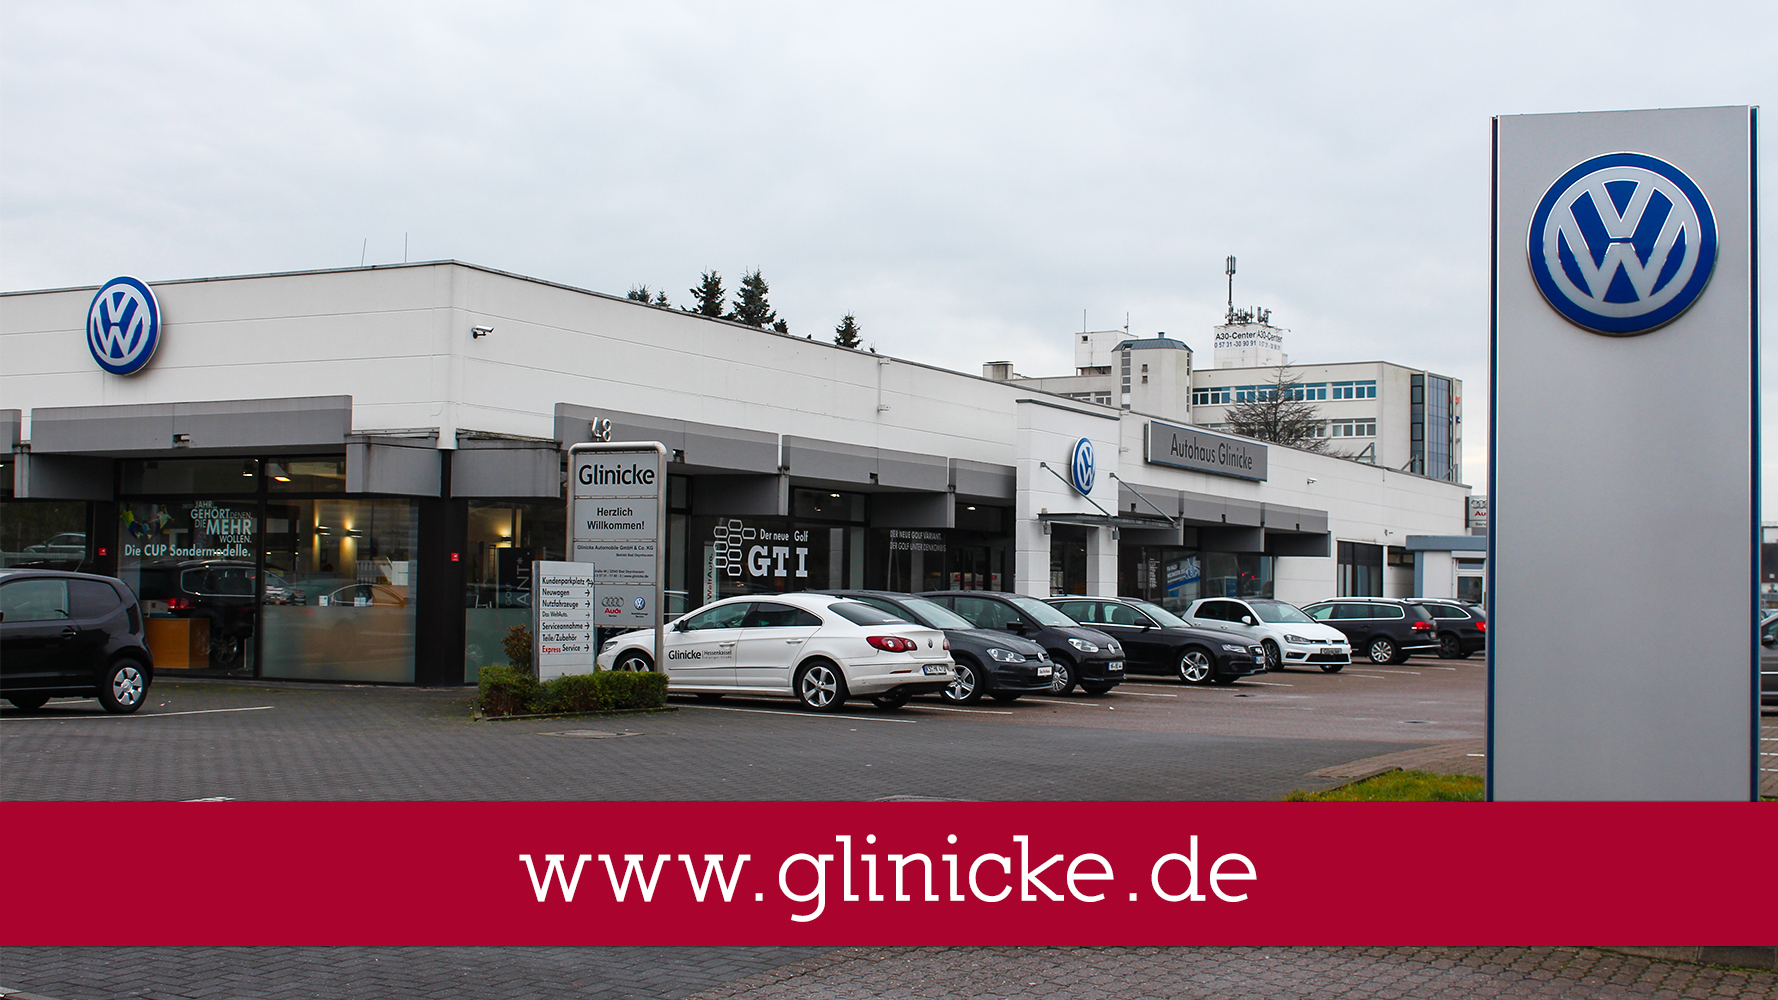 volkswagen bad oeynhausen glinicke in bad oeynhausen. Black Bedroom Furniture Sets. Home Design Ideas